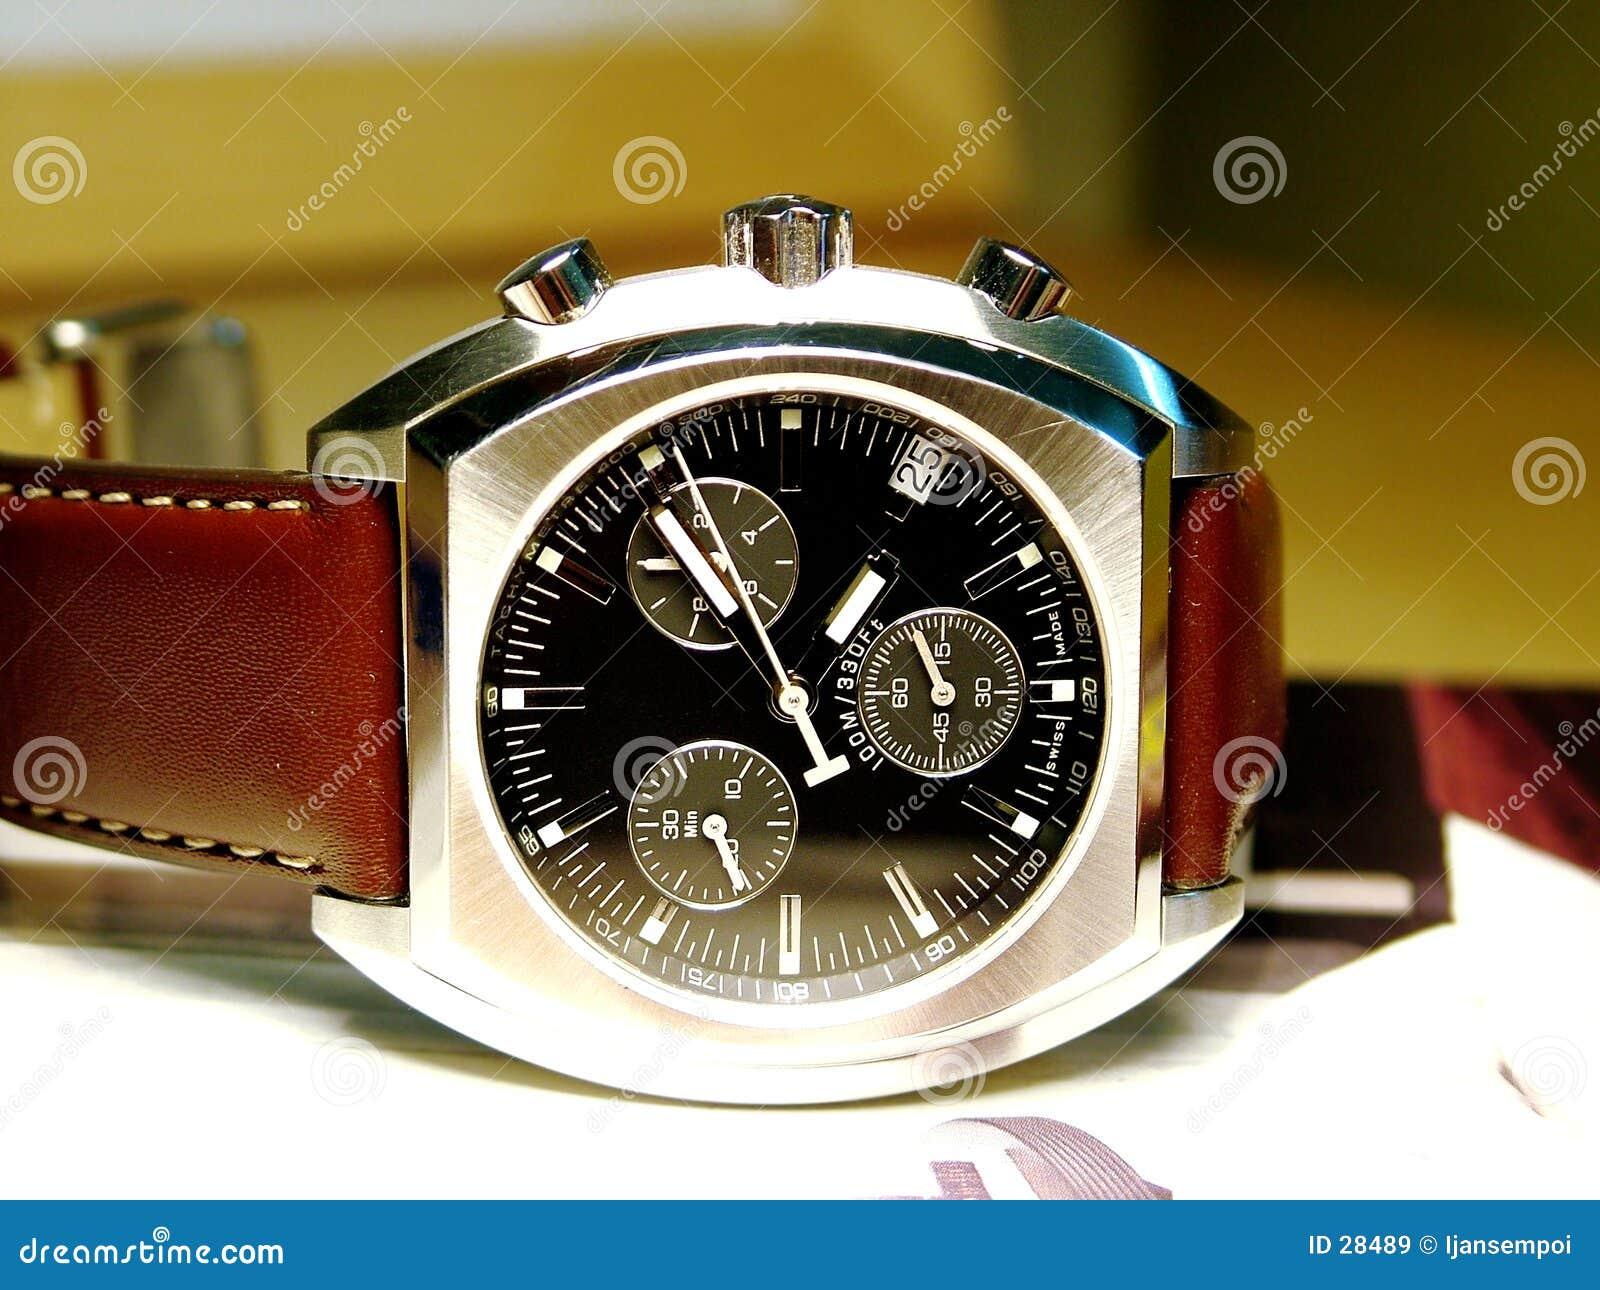 Download ρολόι στοκ εικόνα. εικόνα από δείτε, μυαλό, πάρτε, παρευρίσκεται - 28489